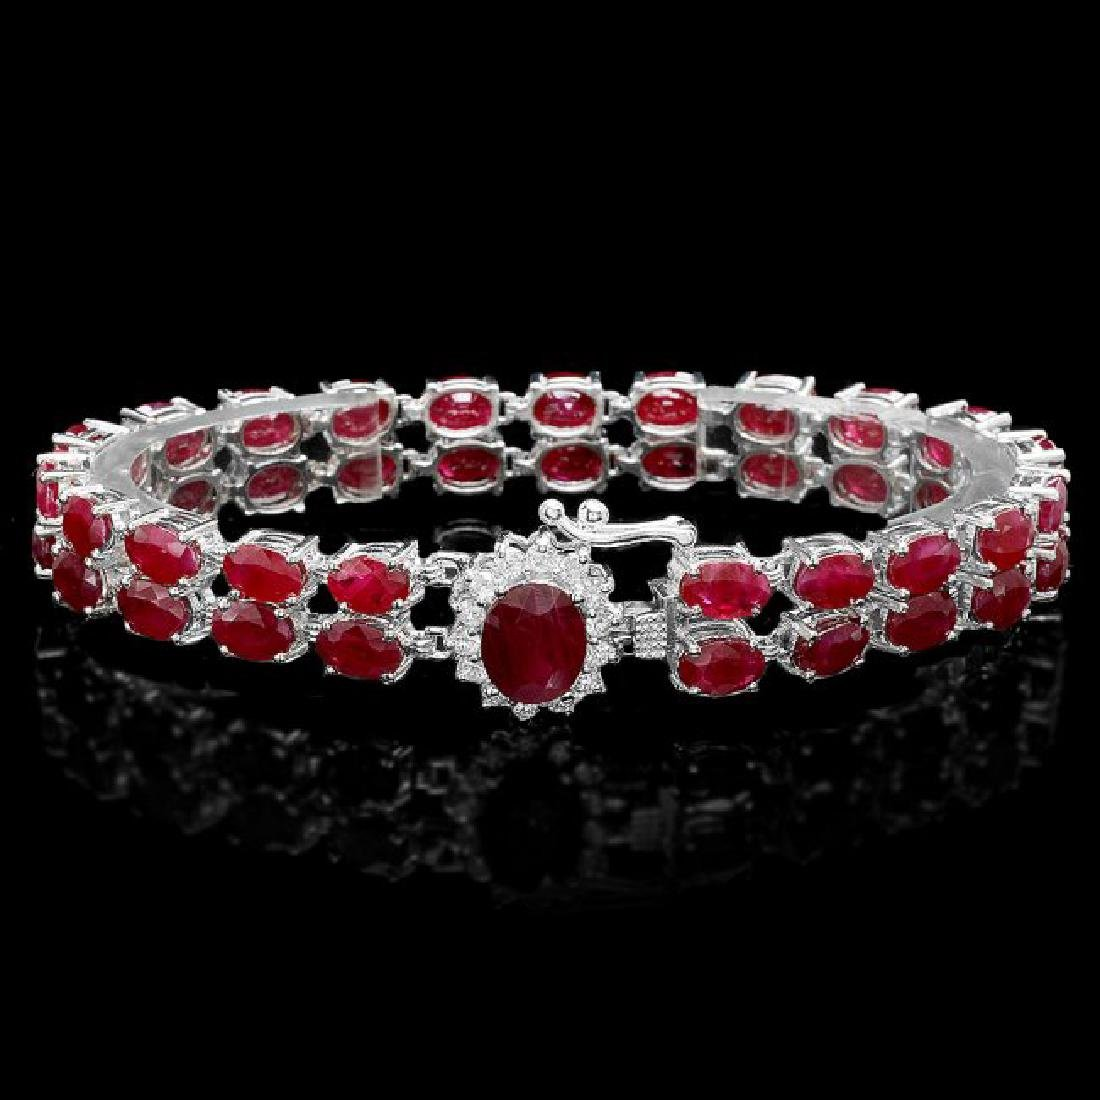 14k White Gold 28ct Ruby 0.50ct Diamond Bracelet - 2